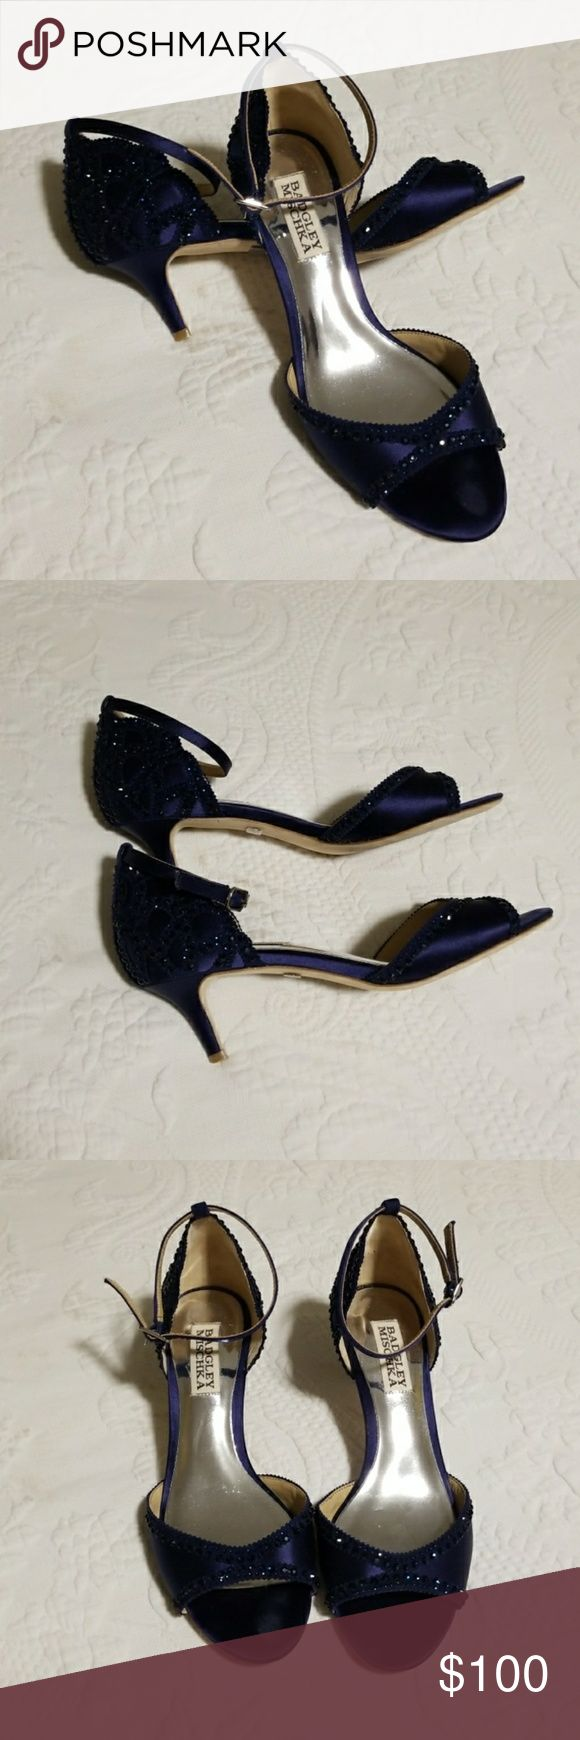 Badgley Mischka Gillian Heels Blauer Badgley Mischka Gillian Abendschuh, getragen auf …   – My Posh Picks